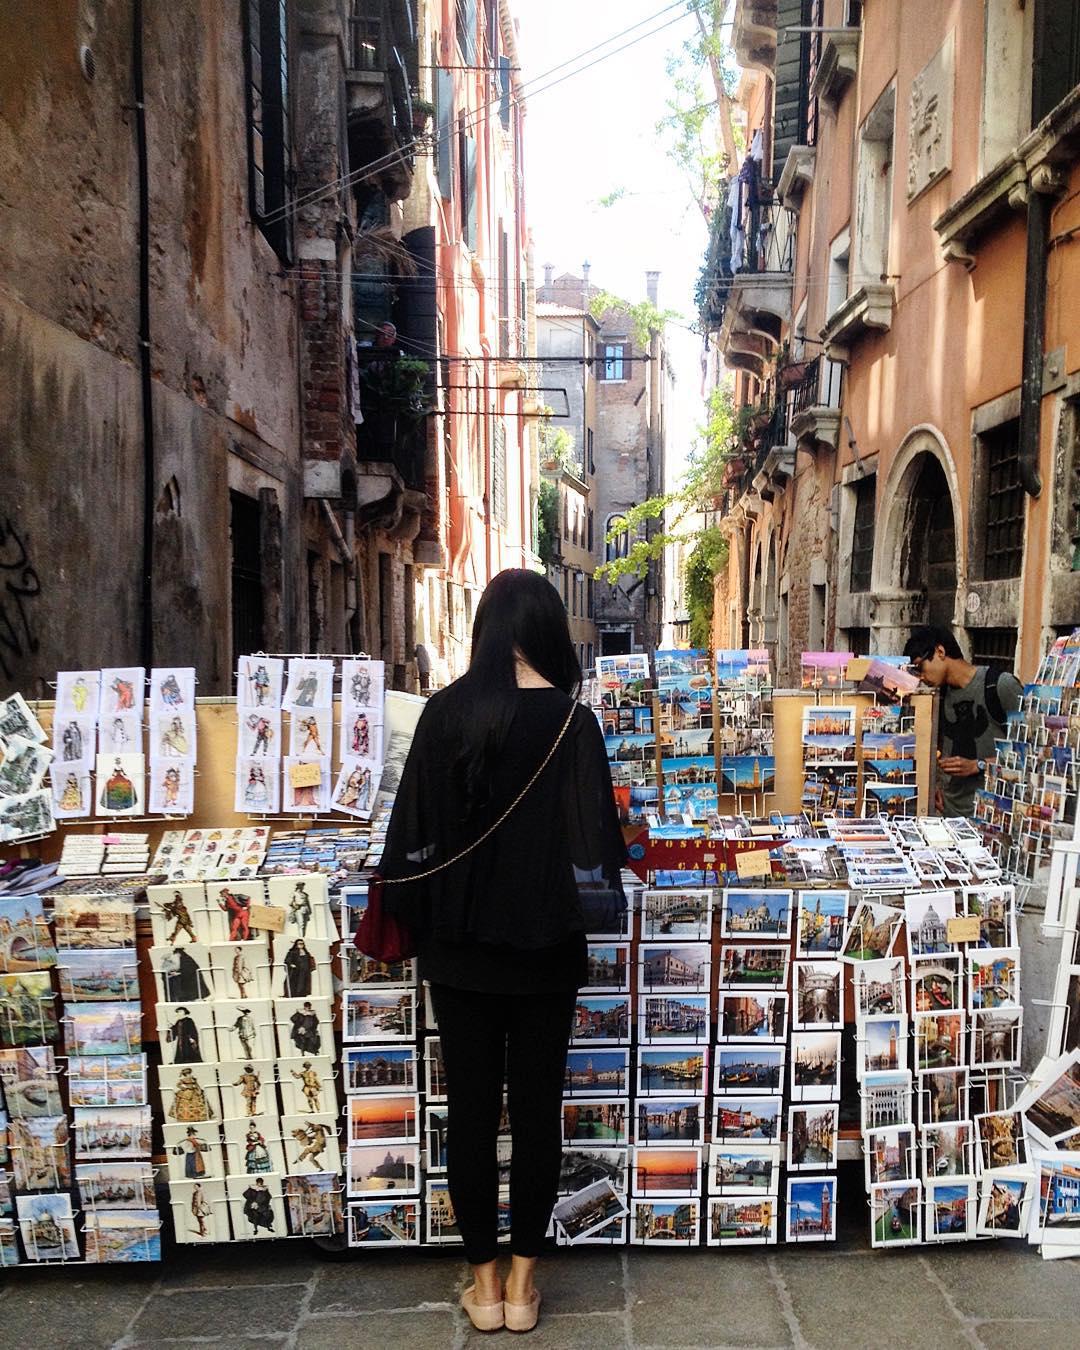 cartolina da Venezia  #postcard #cards #venice #venezia #italy #stamp #cartolina